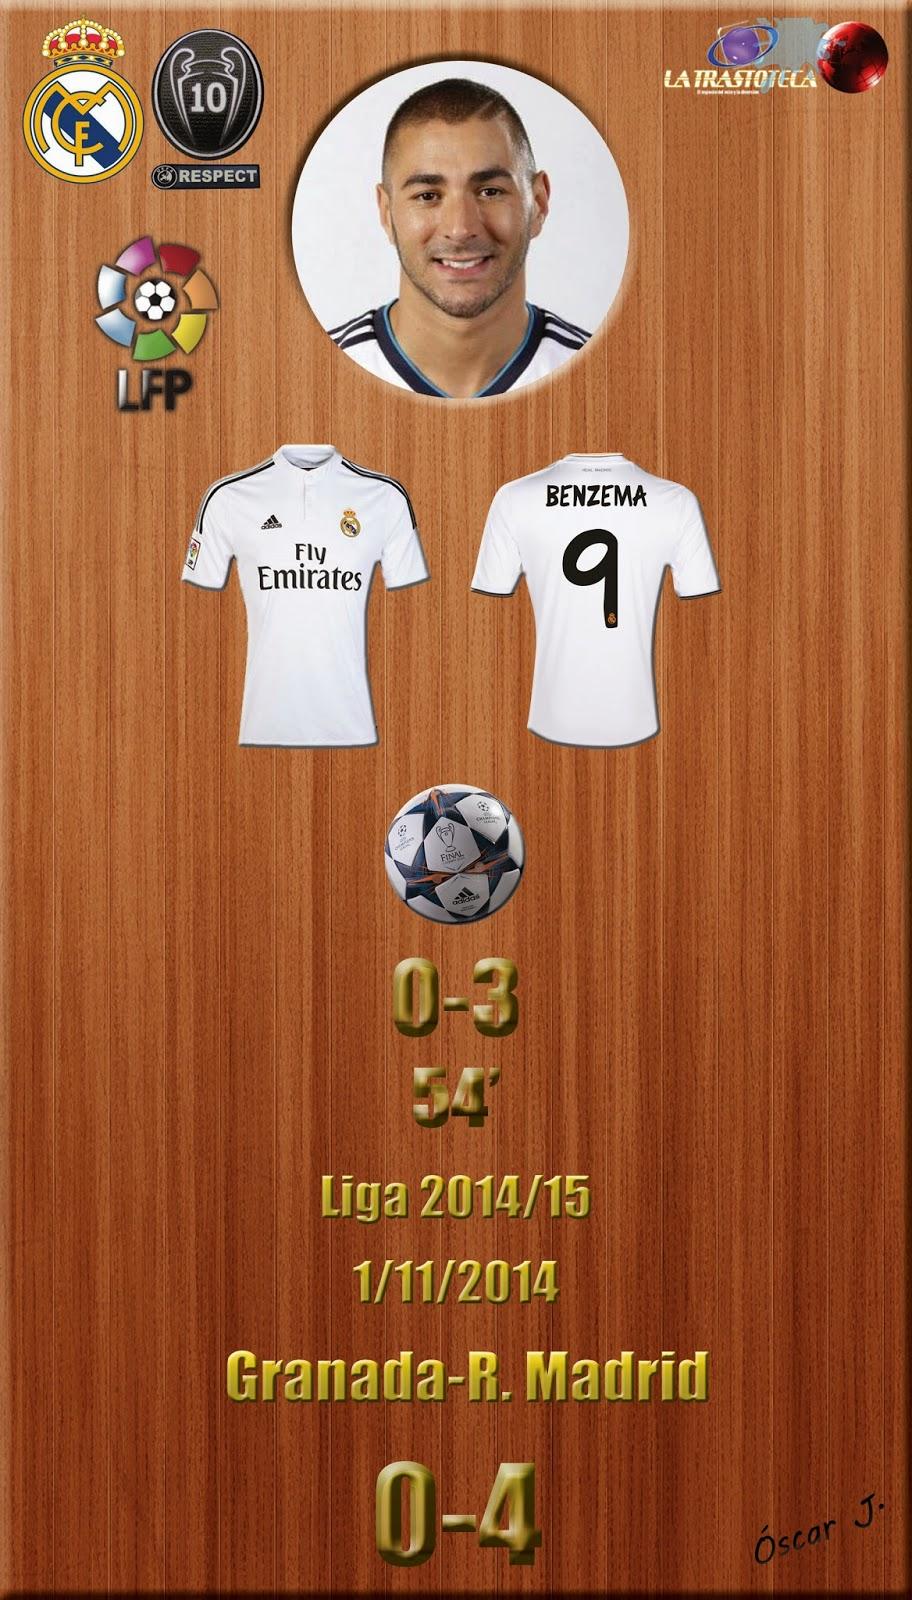 Benzema - (0-3) - Granada 0-4 Real Madrid - Liga 2014/15 - (1/11/2014)